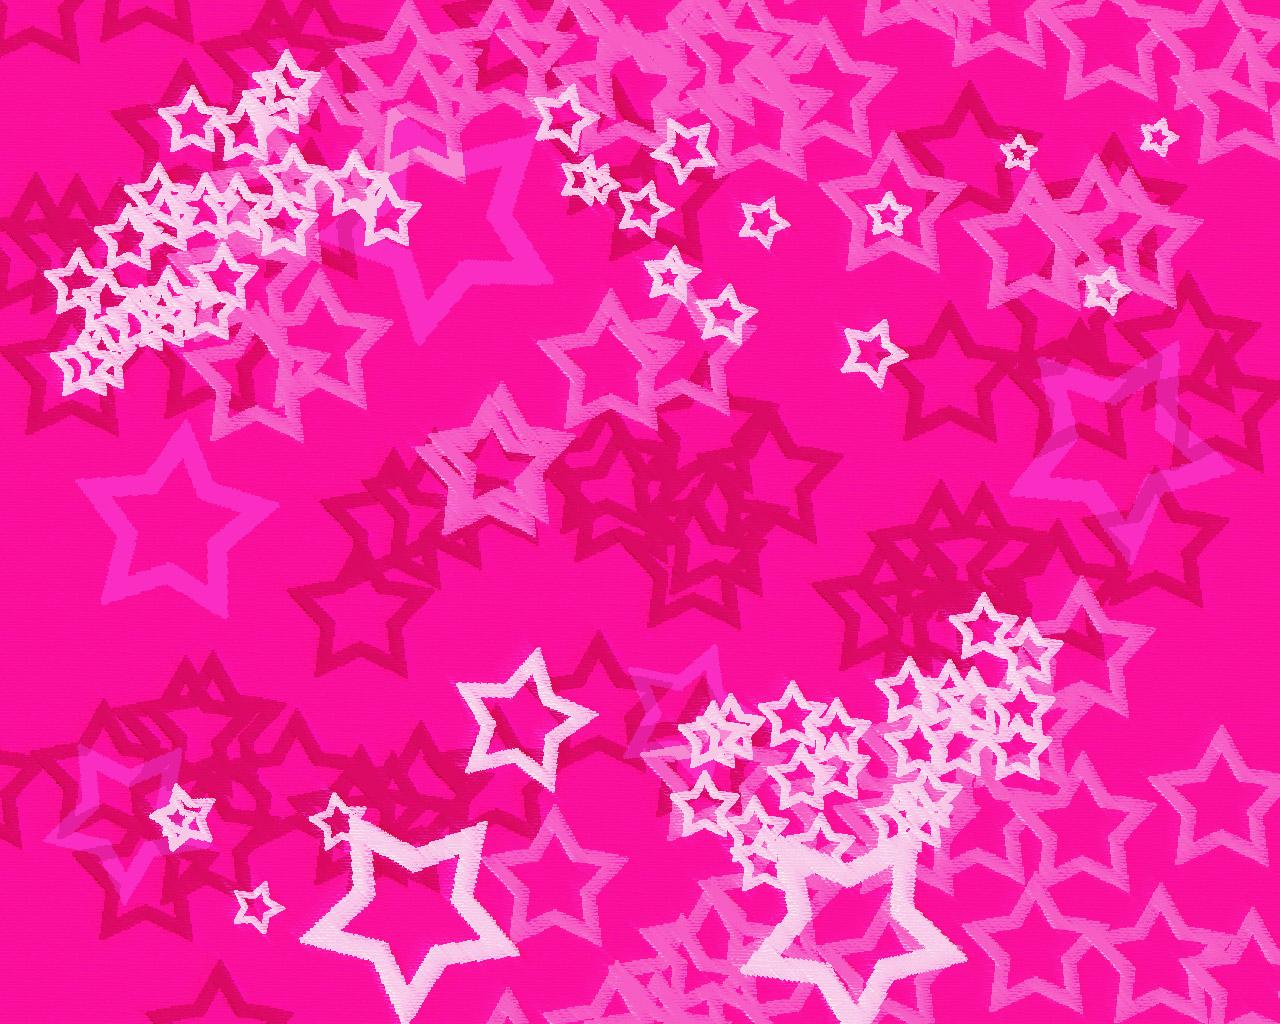 pink desktop backgrounds pink desktop backgrounds Desktop 1280x1024